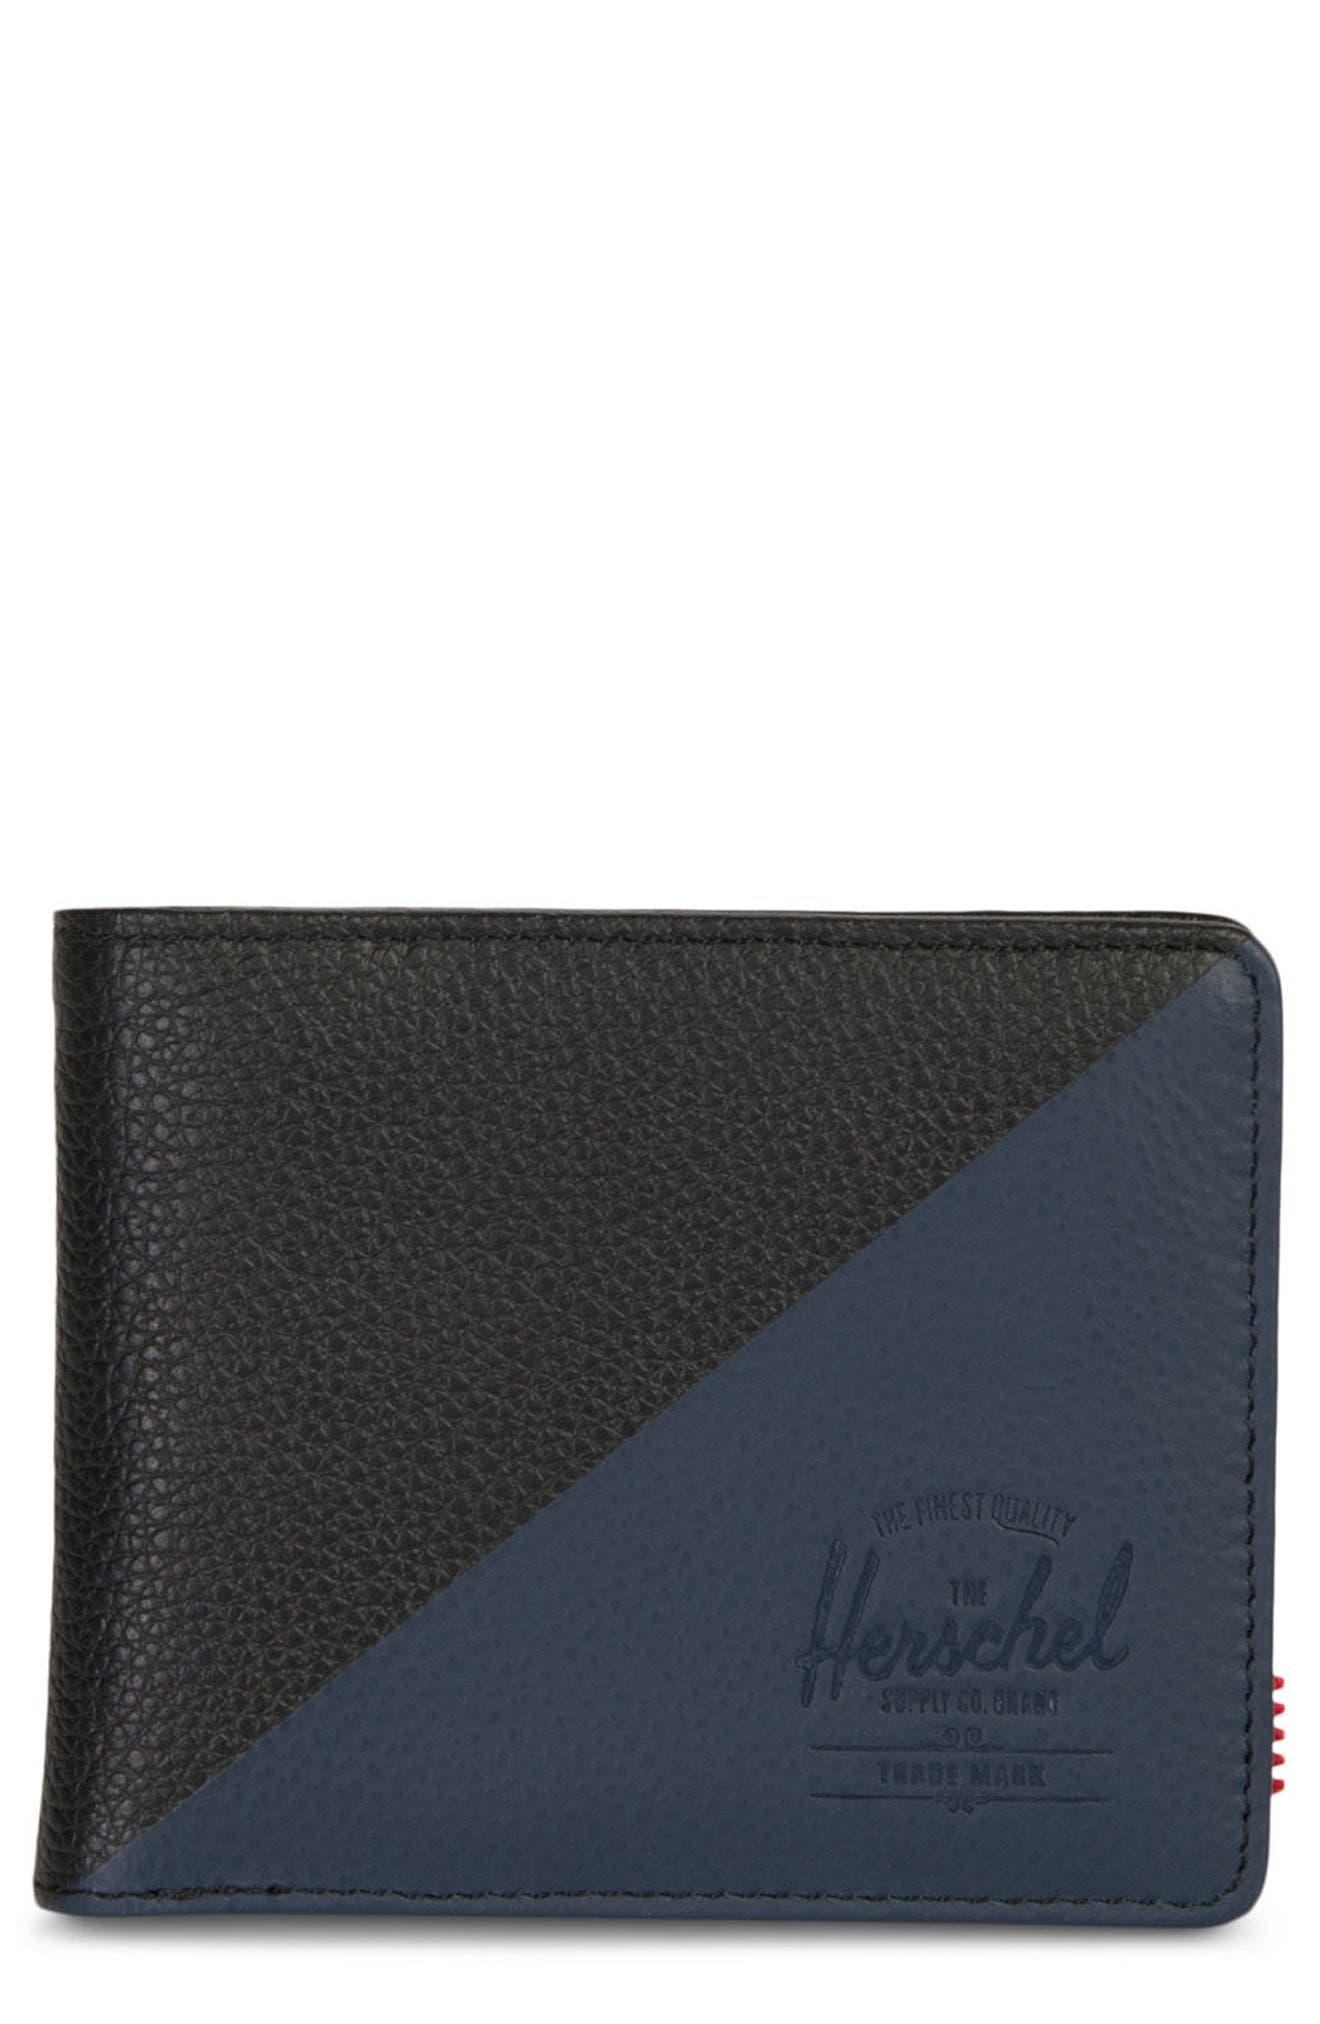 Hank Leather Wallet,                             Main thumbnail 1, color,                             Black